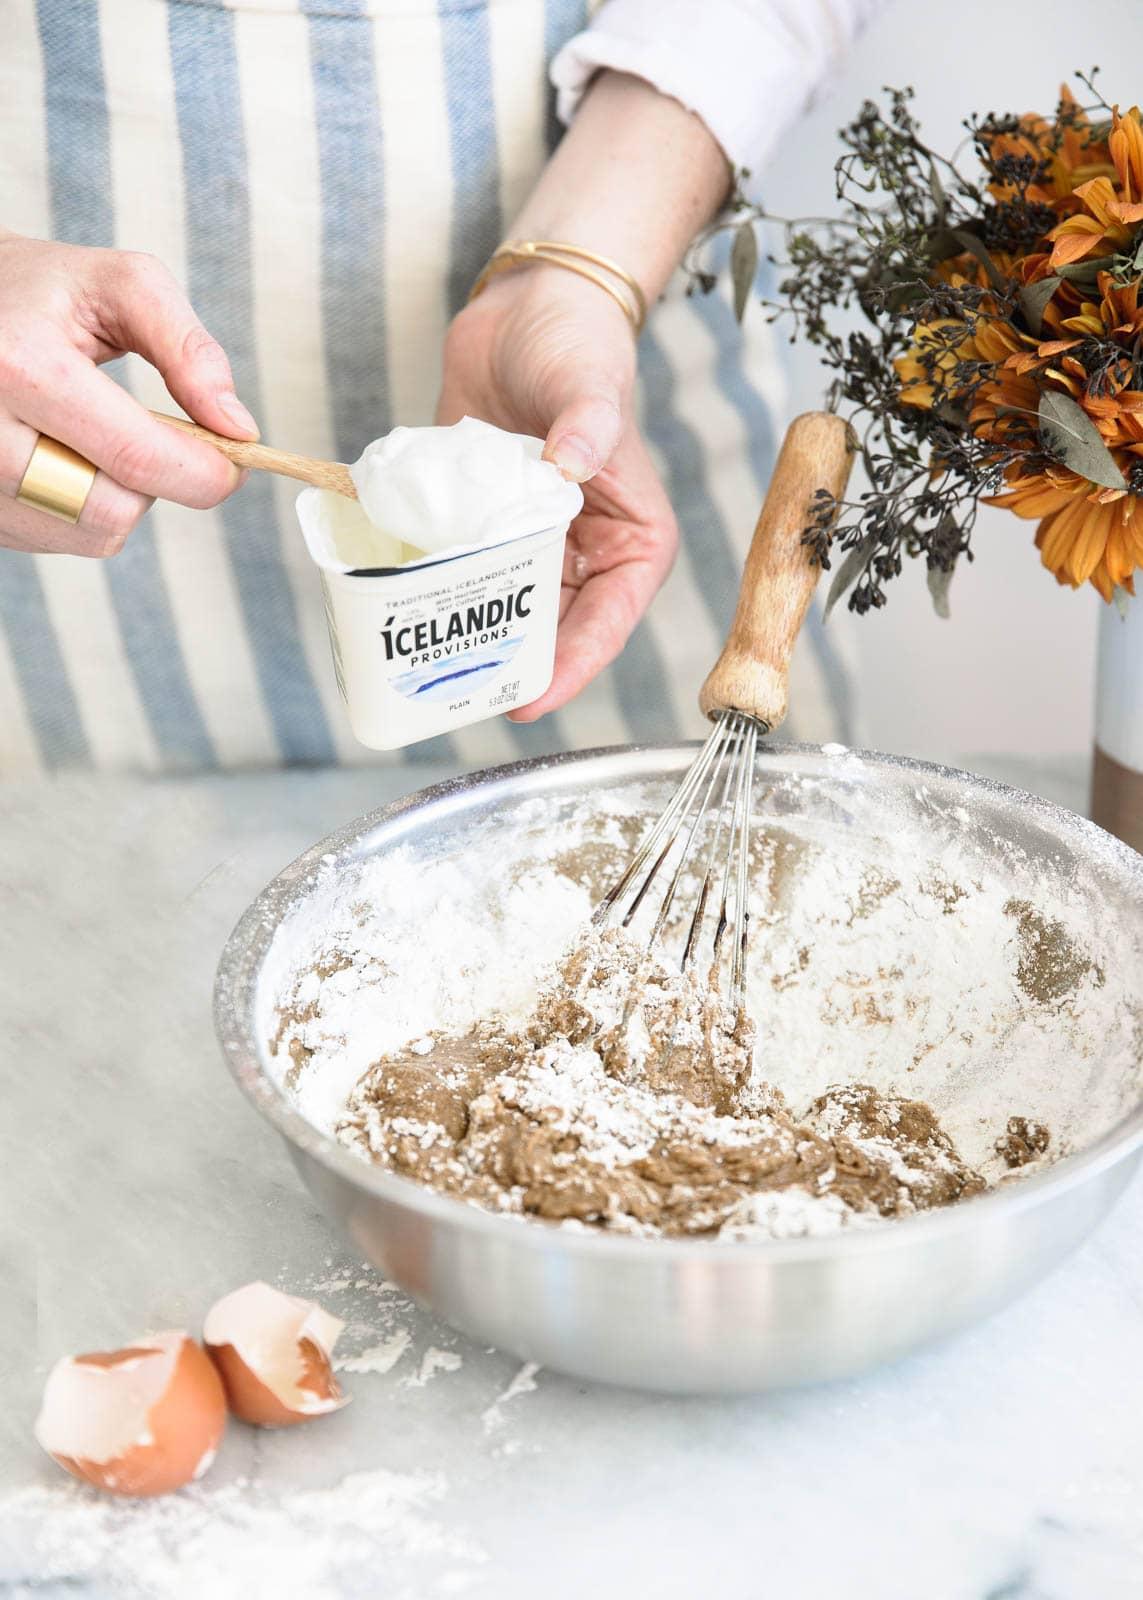 How to make a Skyr Spice Cake